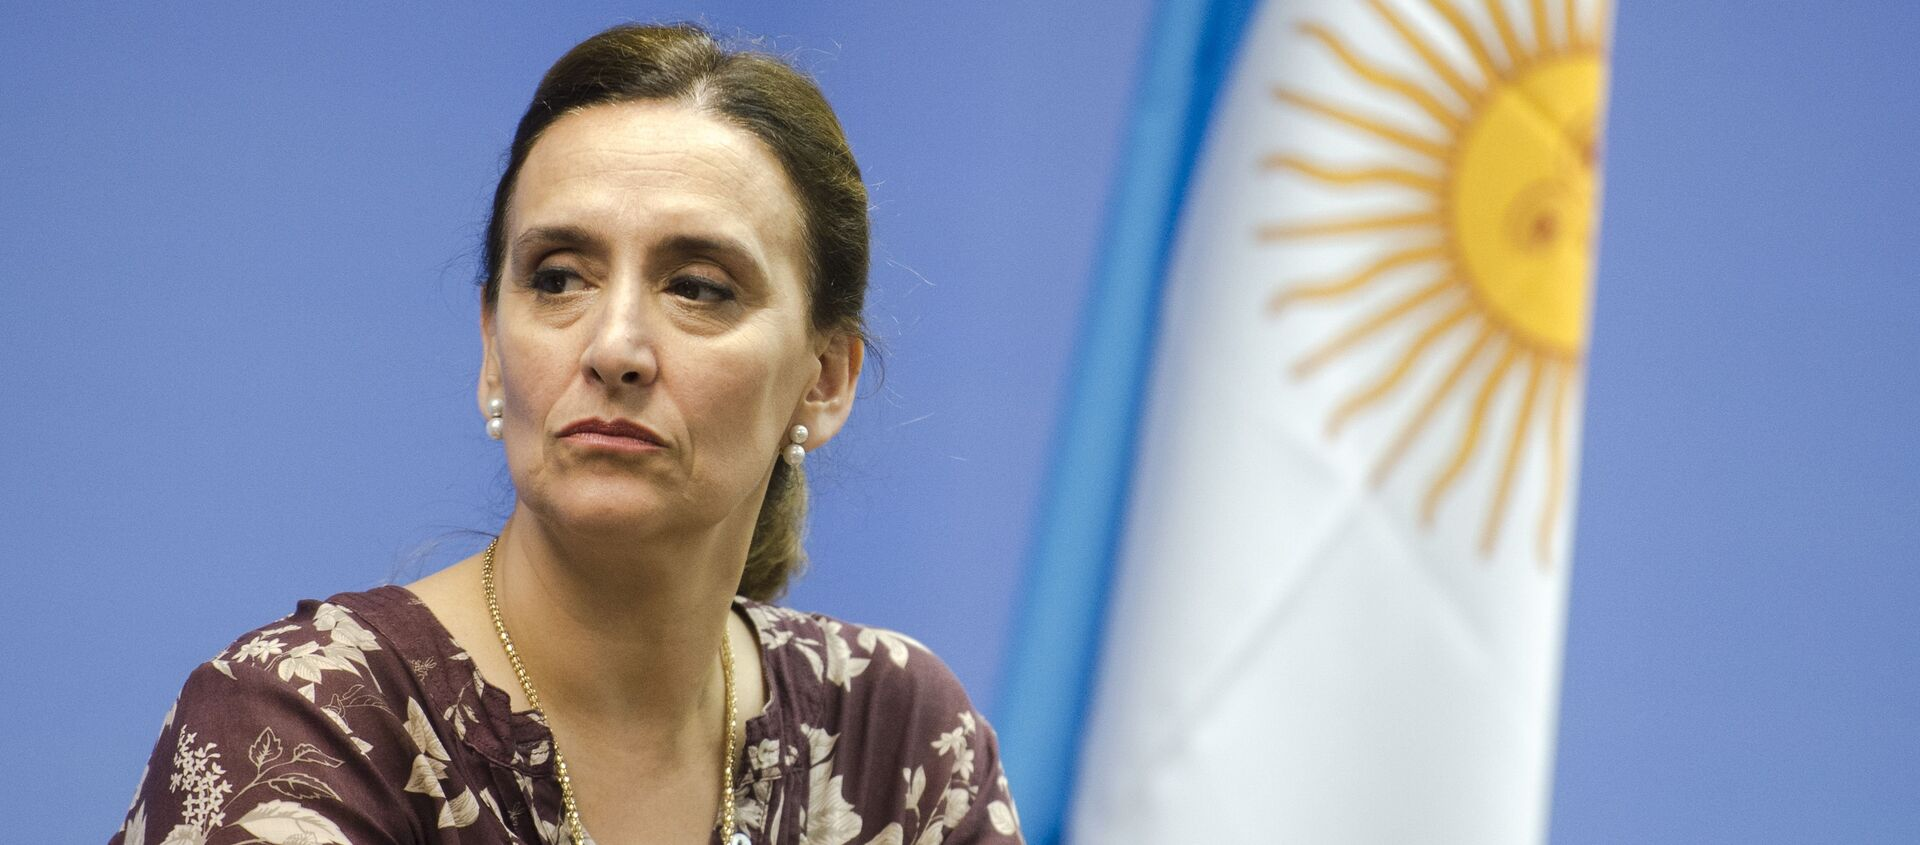 Gabriela Michetti, exvicepresidenta argentina (archivo) - Sputnik Mundo, 1920, 28.05.2020